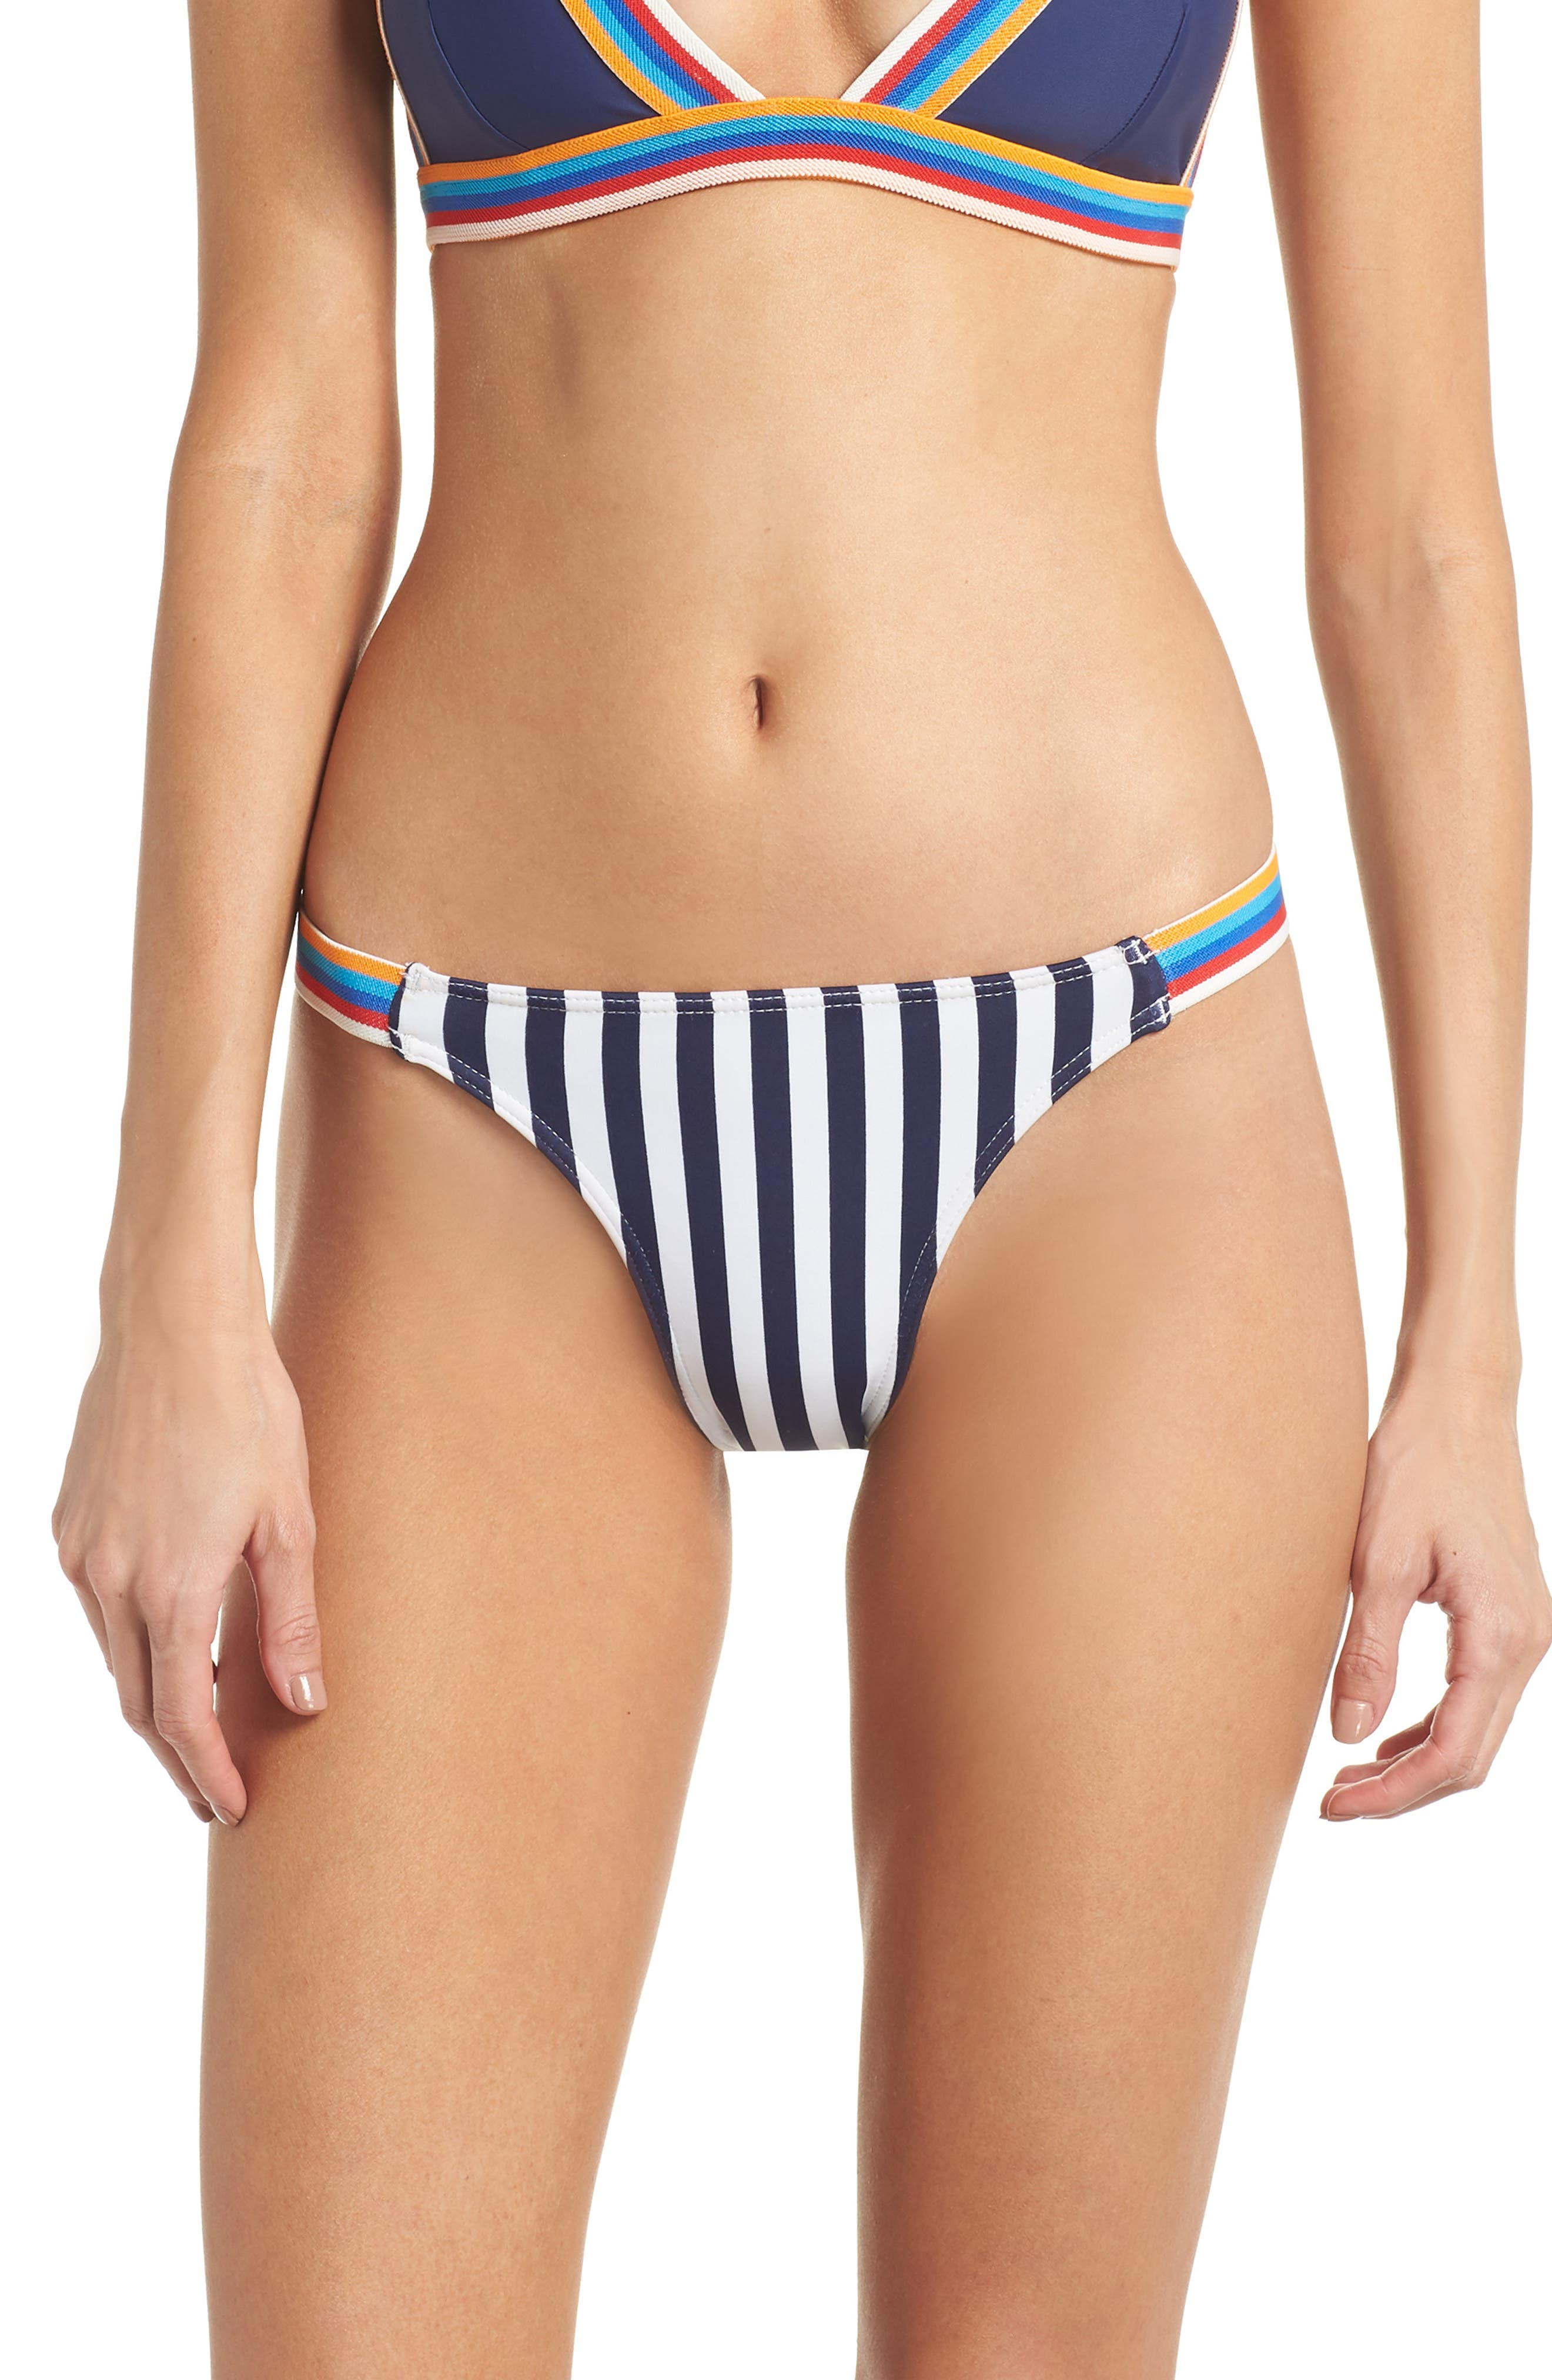 Sizzle Bikini Bottoms,                         Main,                         color, Navy